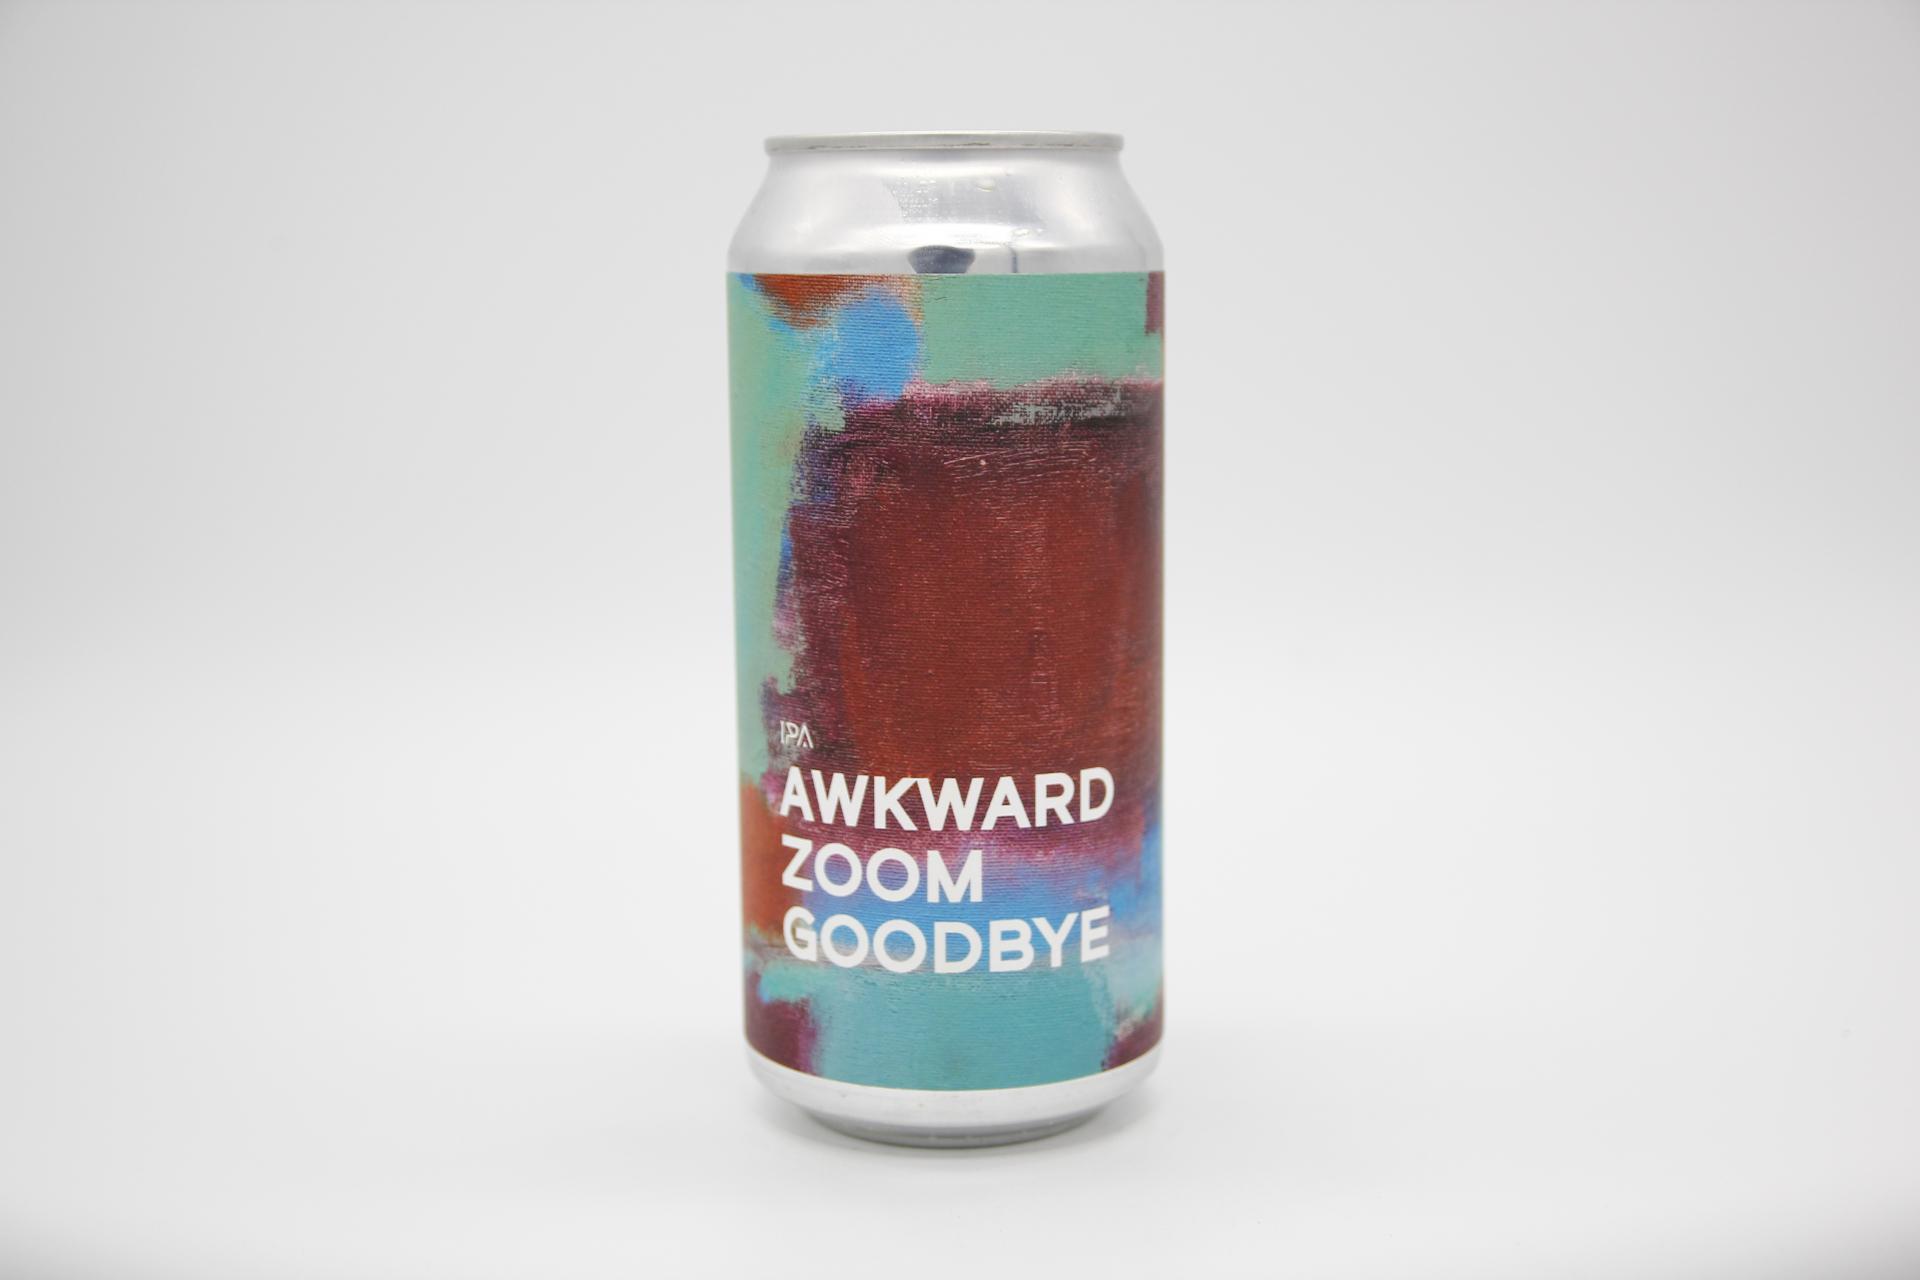 BOUNDARY - AWKWARD ZOOM GOODBYE 44cl